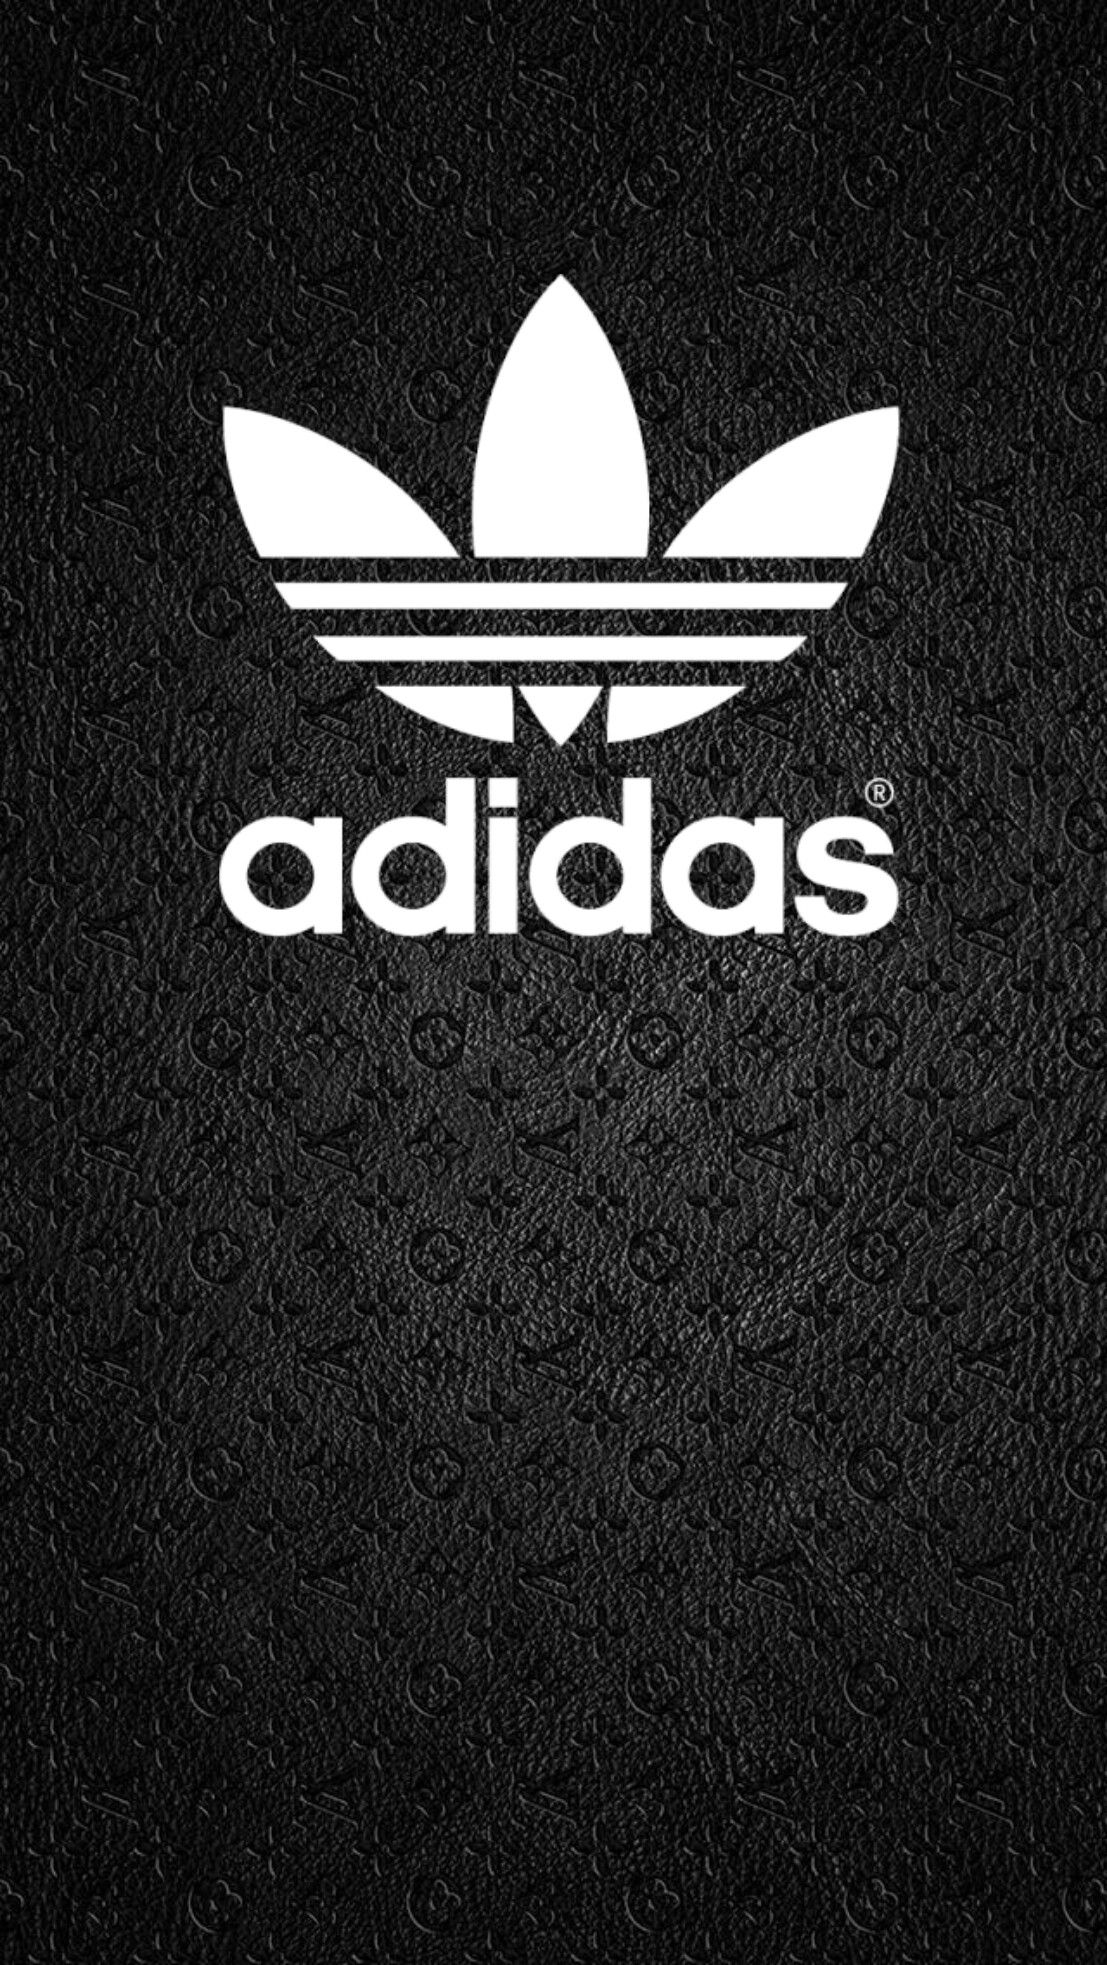 Adidas Logo White On Black BG Wallpaper/Background